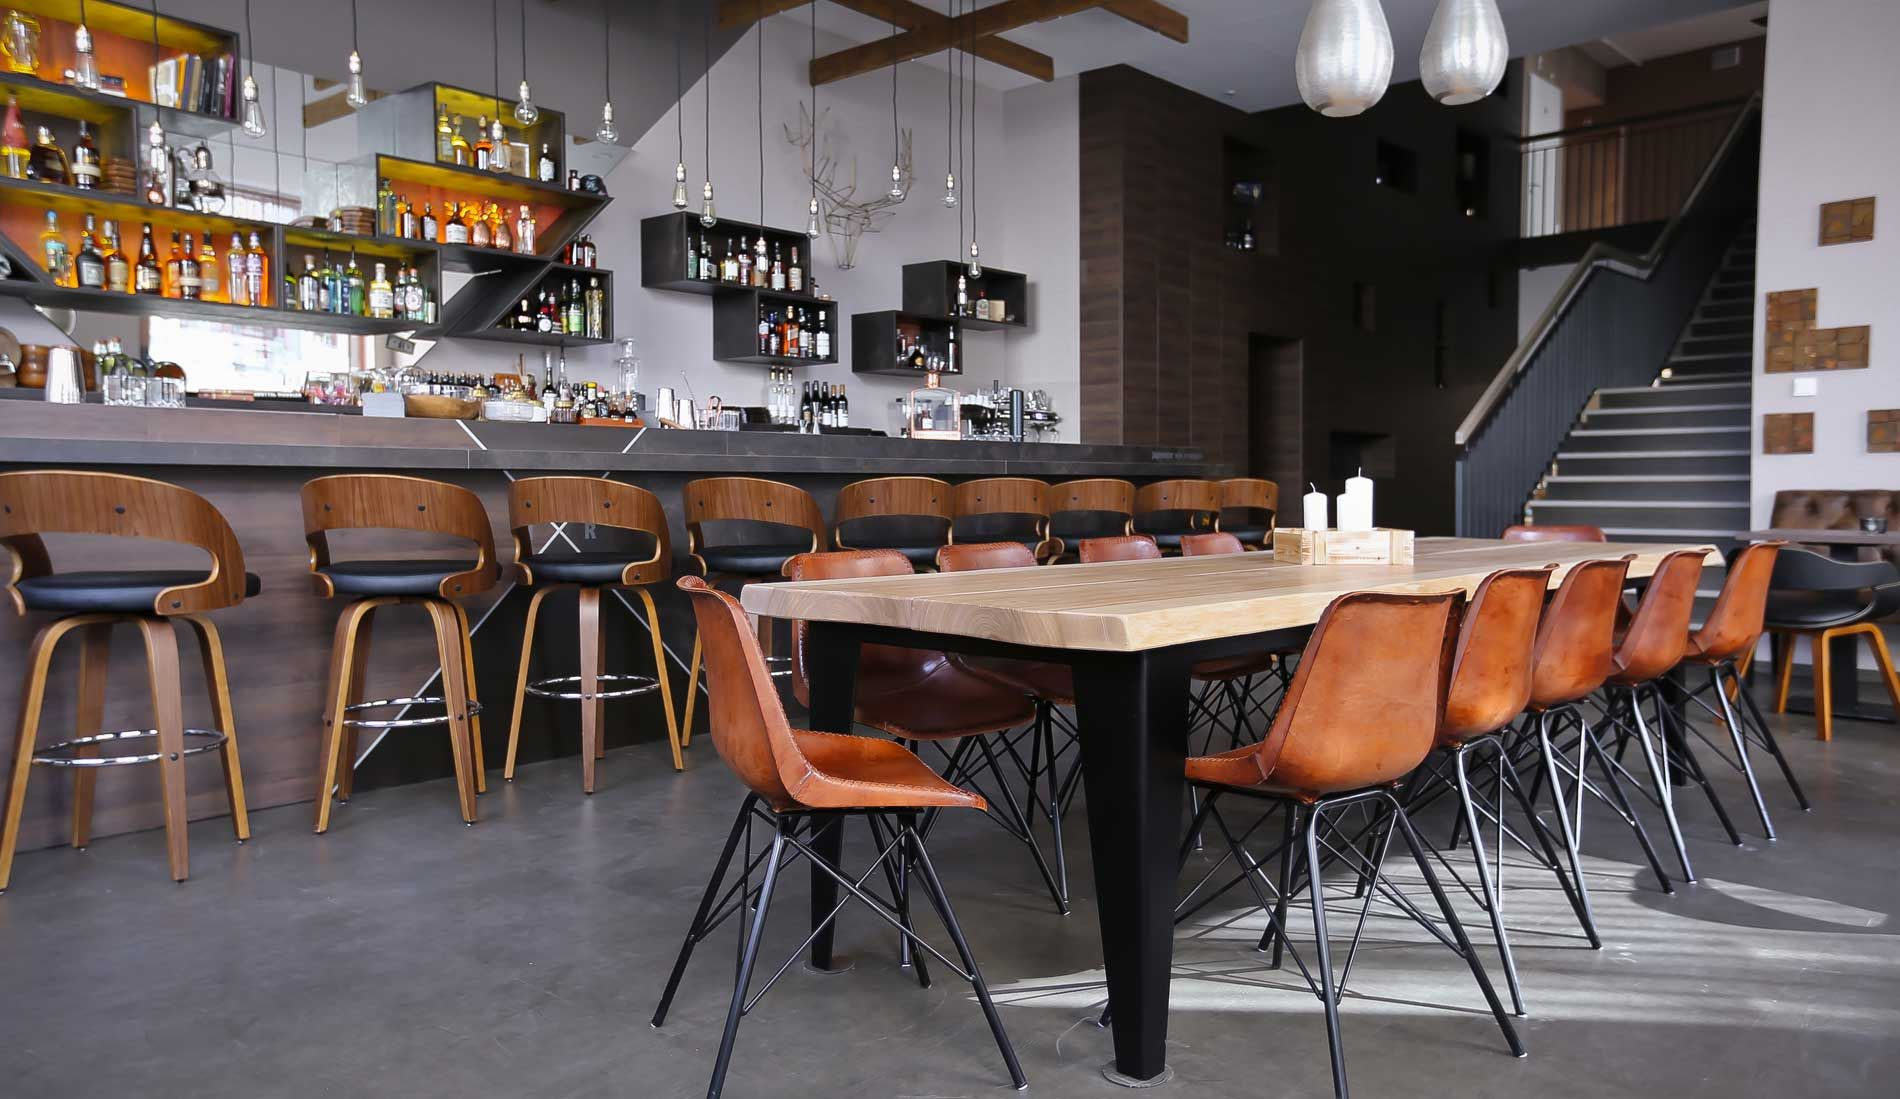 Bar Restaurant Imperii Moderne Kuche Kalbsrouladen Deutsche Kuche